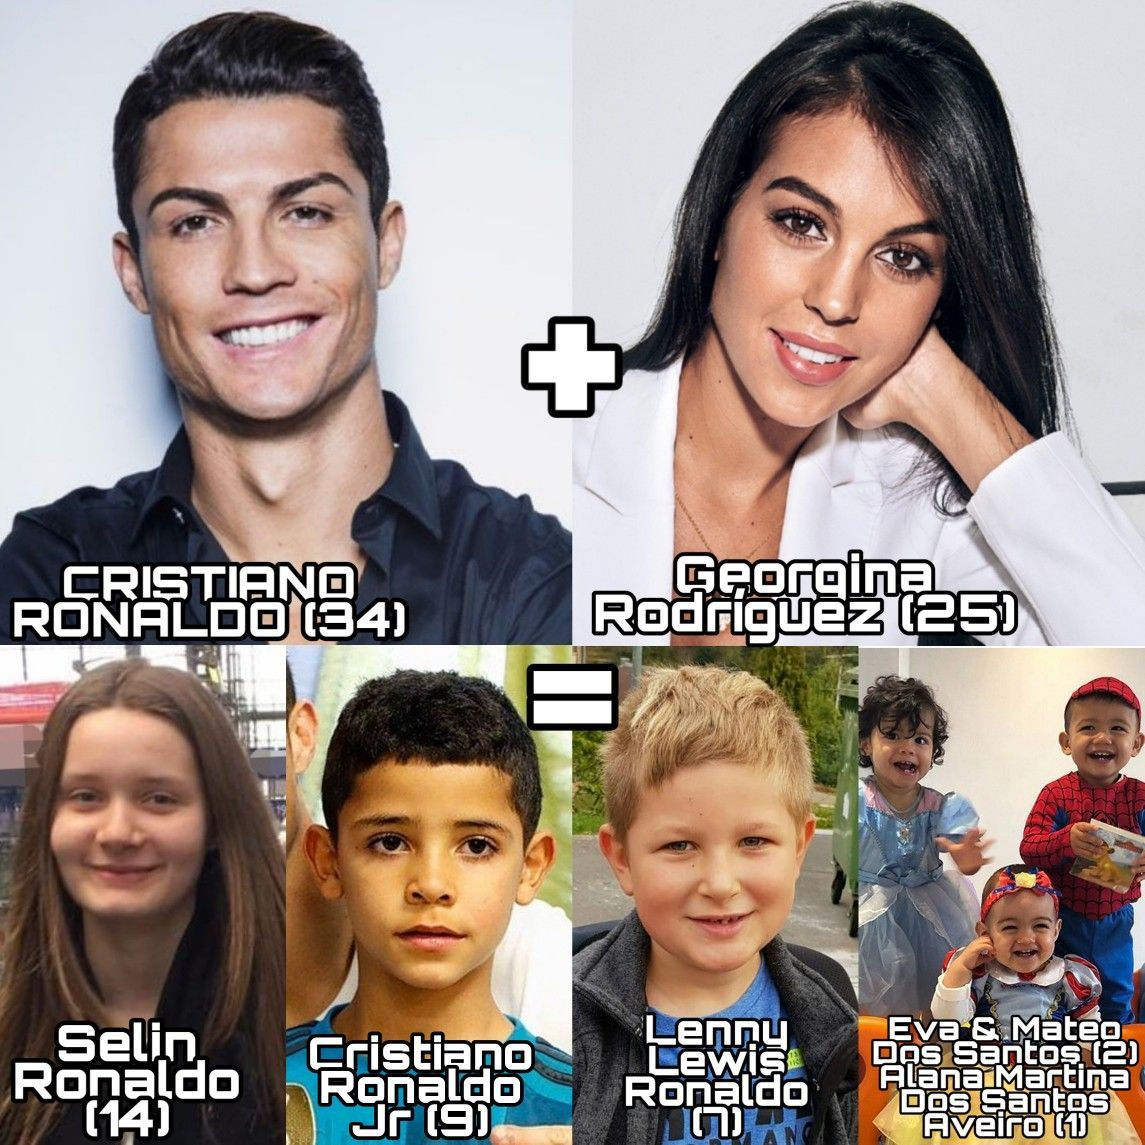 Selin Ronaldo is being abused by Georgina Rodriguez